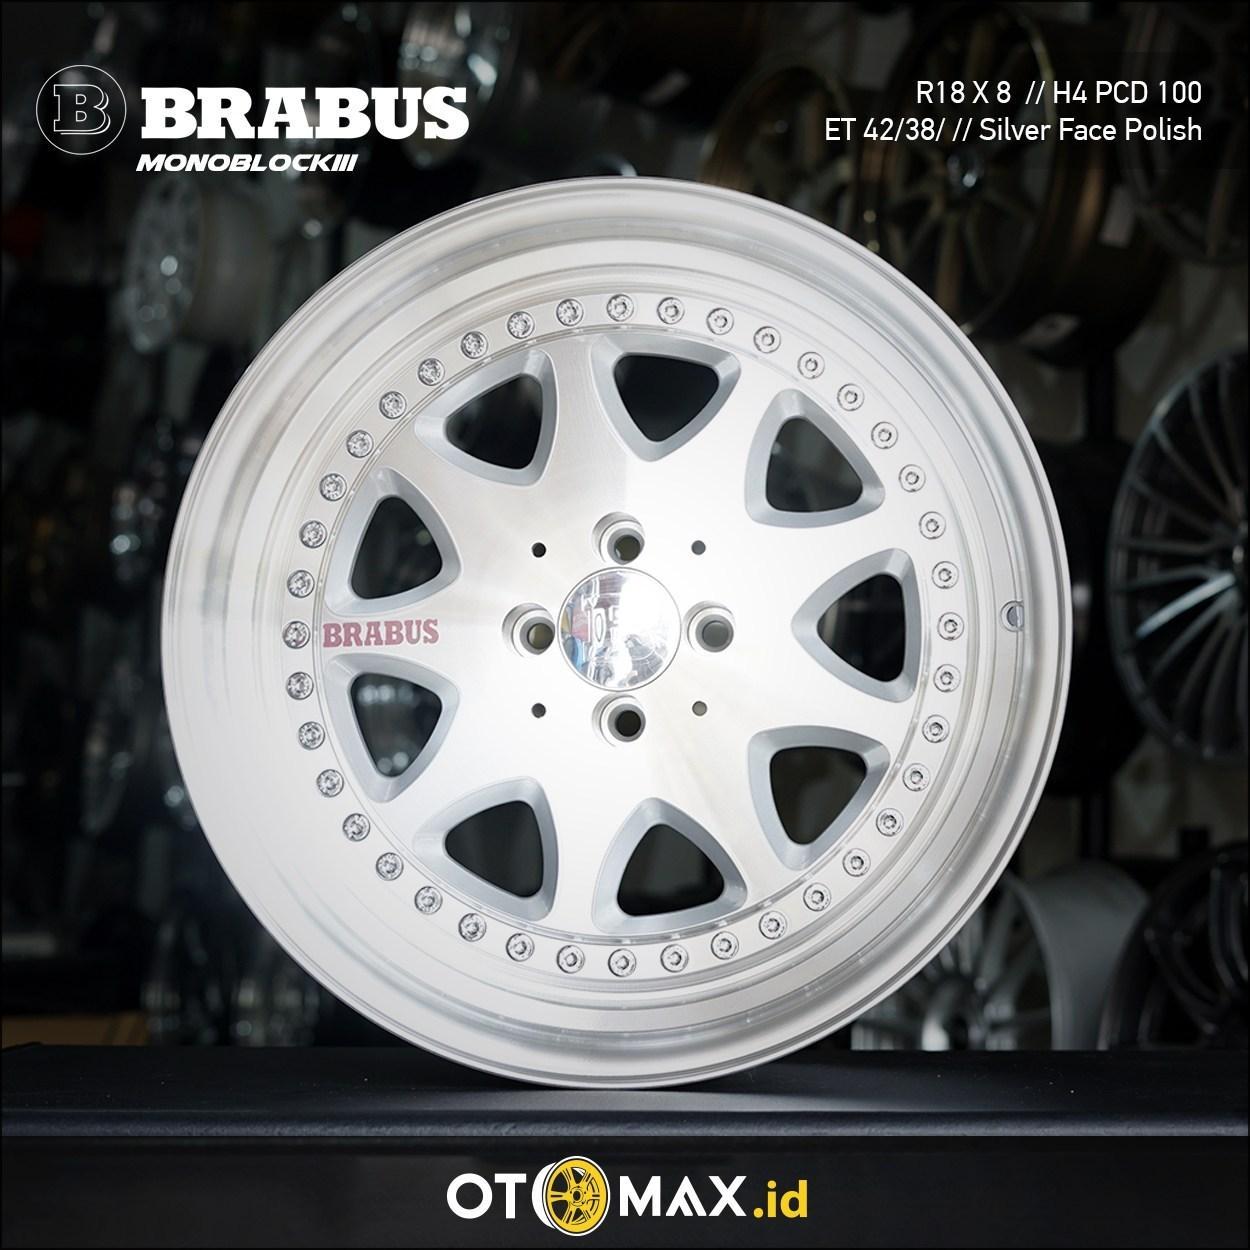 Velg Mobil Brabus Monoblock III Ring 18 Silver Full Polish